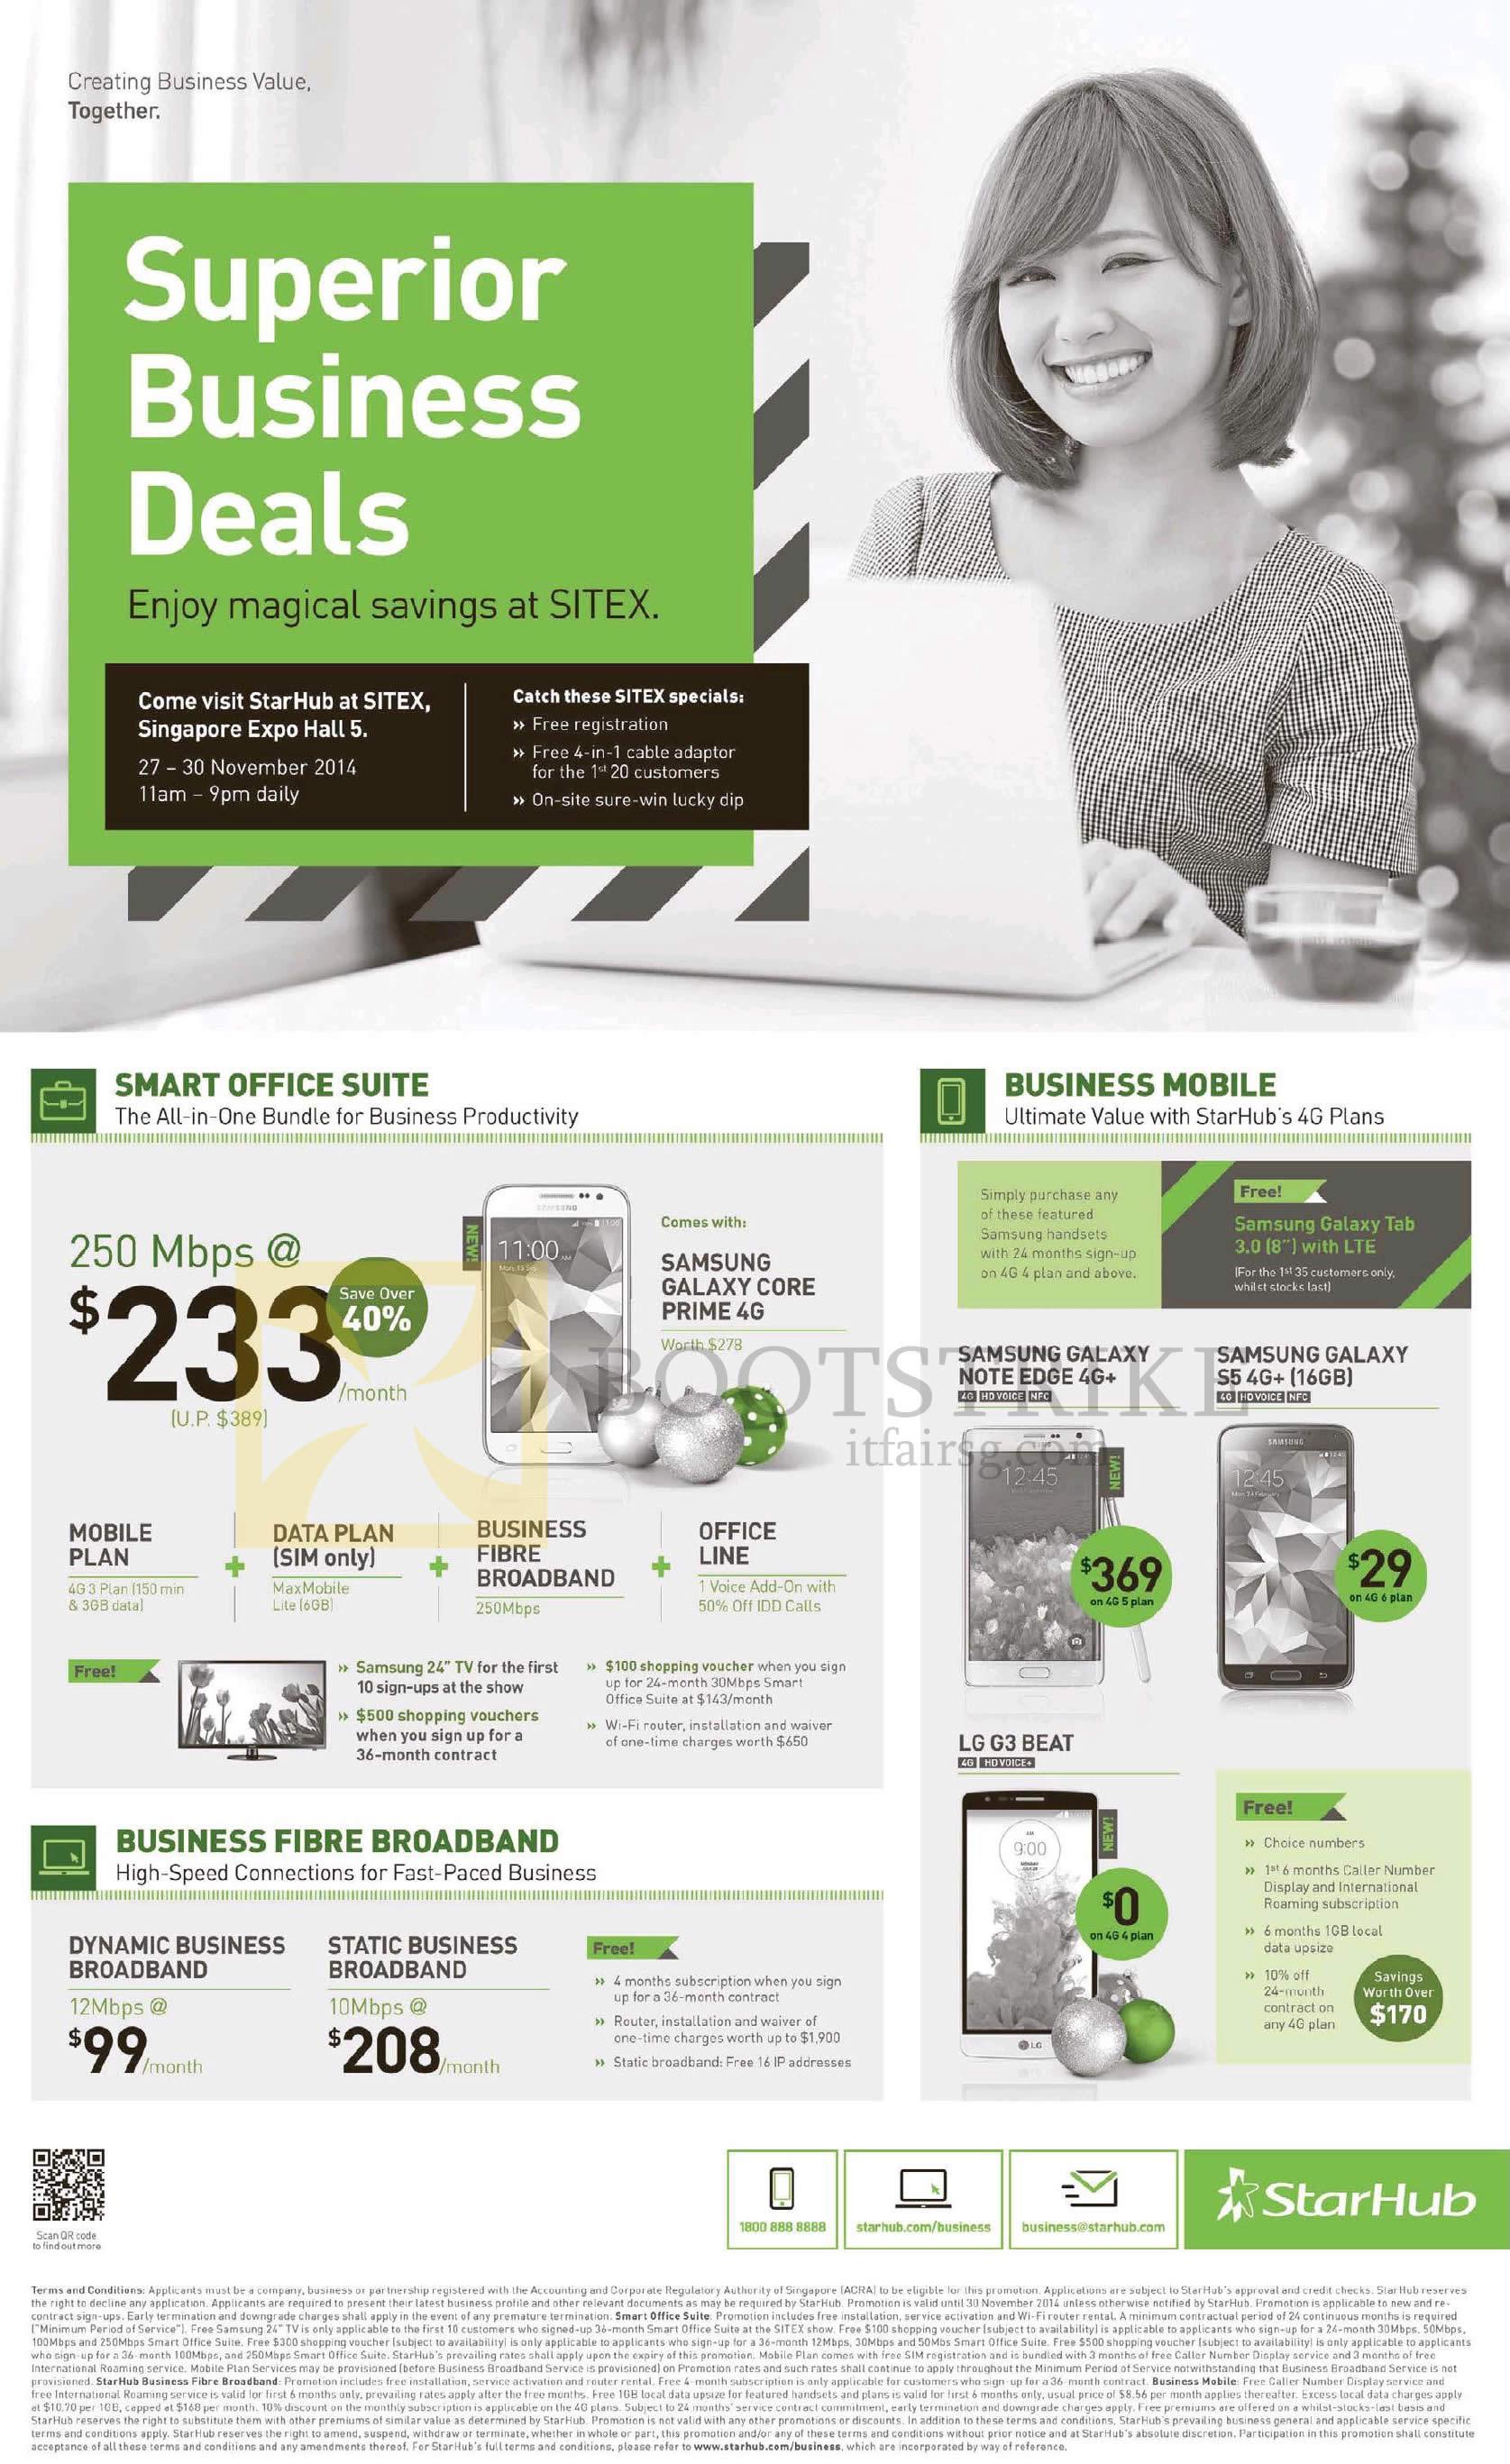 SITEX 2014 price list image brochure of Starhub Business 250Mbps, Dynamic, Static Business Broadband, Samsung Galaxy Note Edge, S5, LG G3 Beat